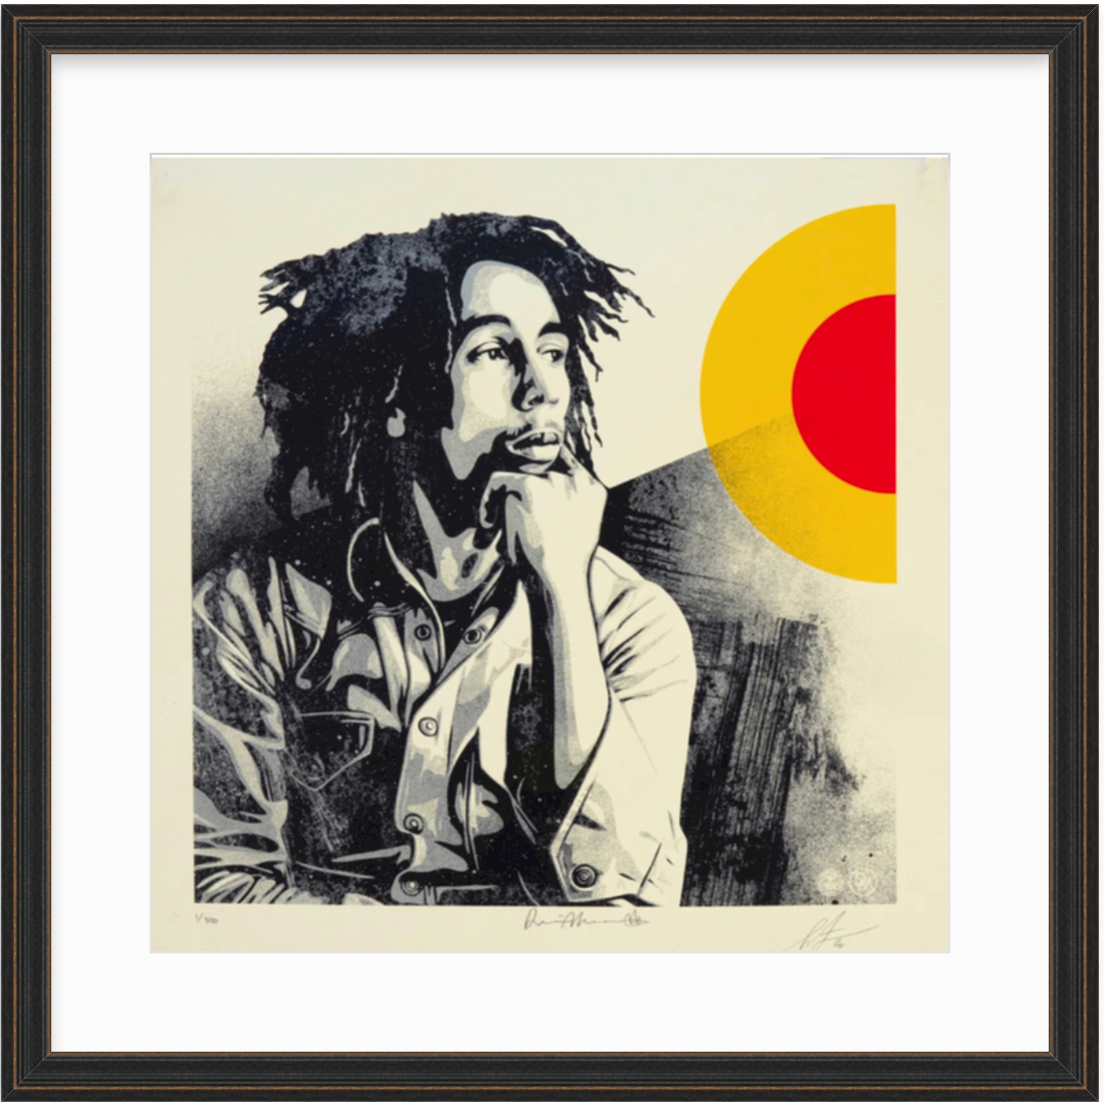 framed art print of Bob Marley